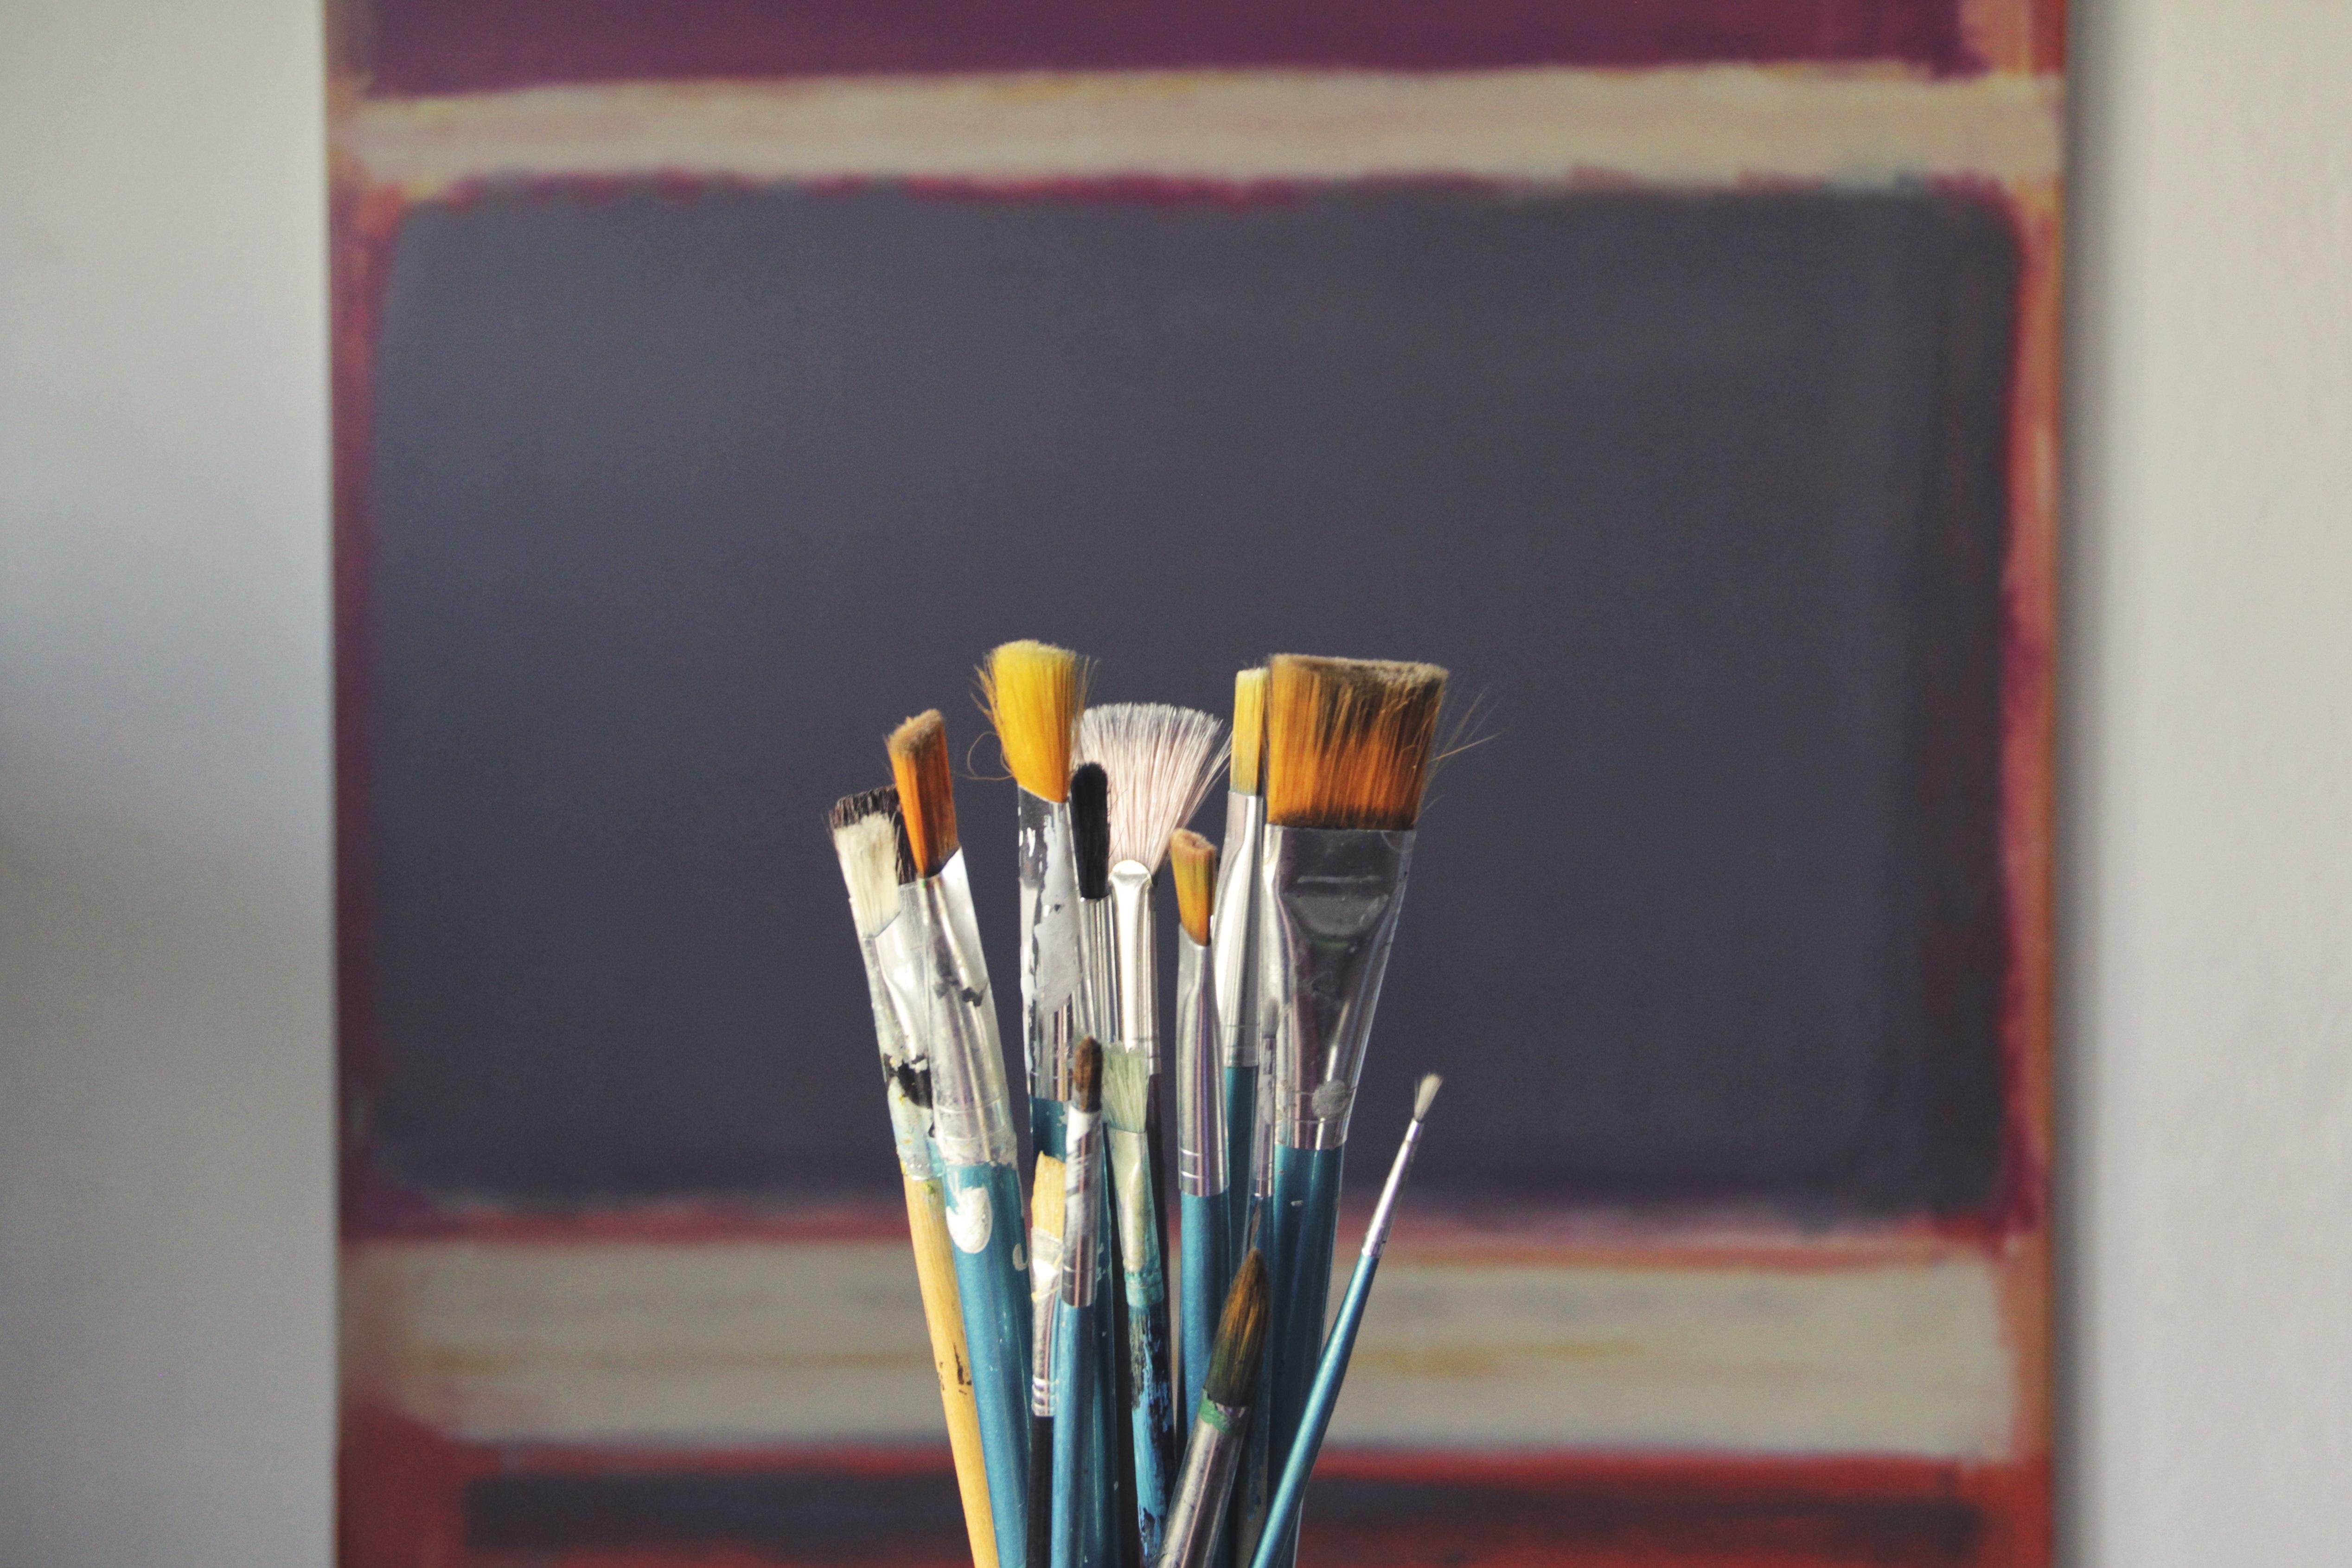 free images creative interior brush tool decoration red rh pxhere com